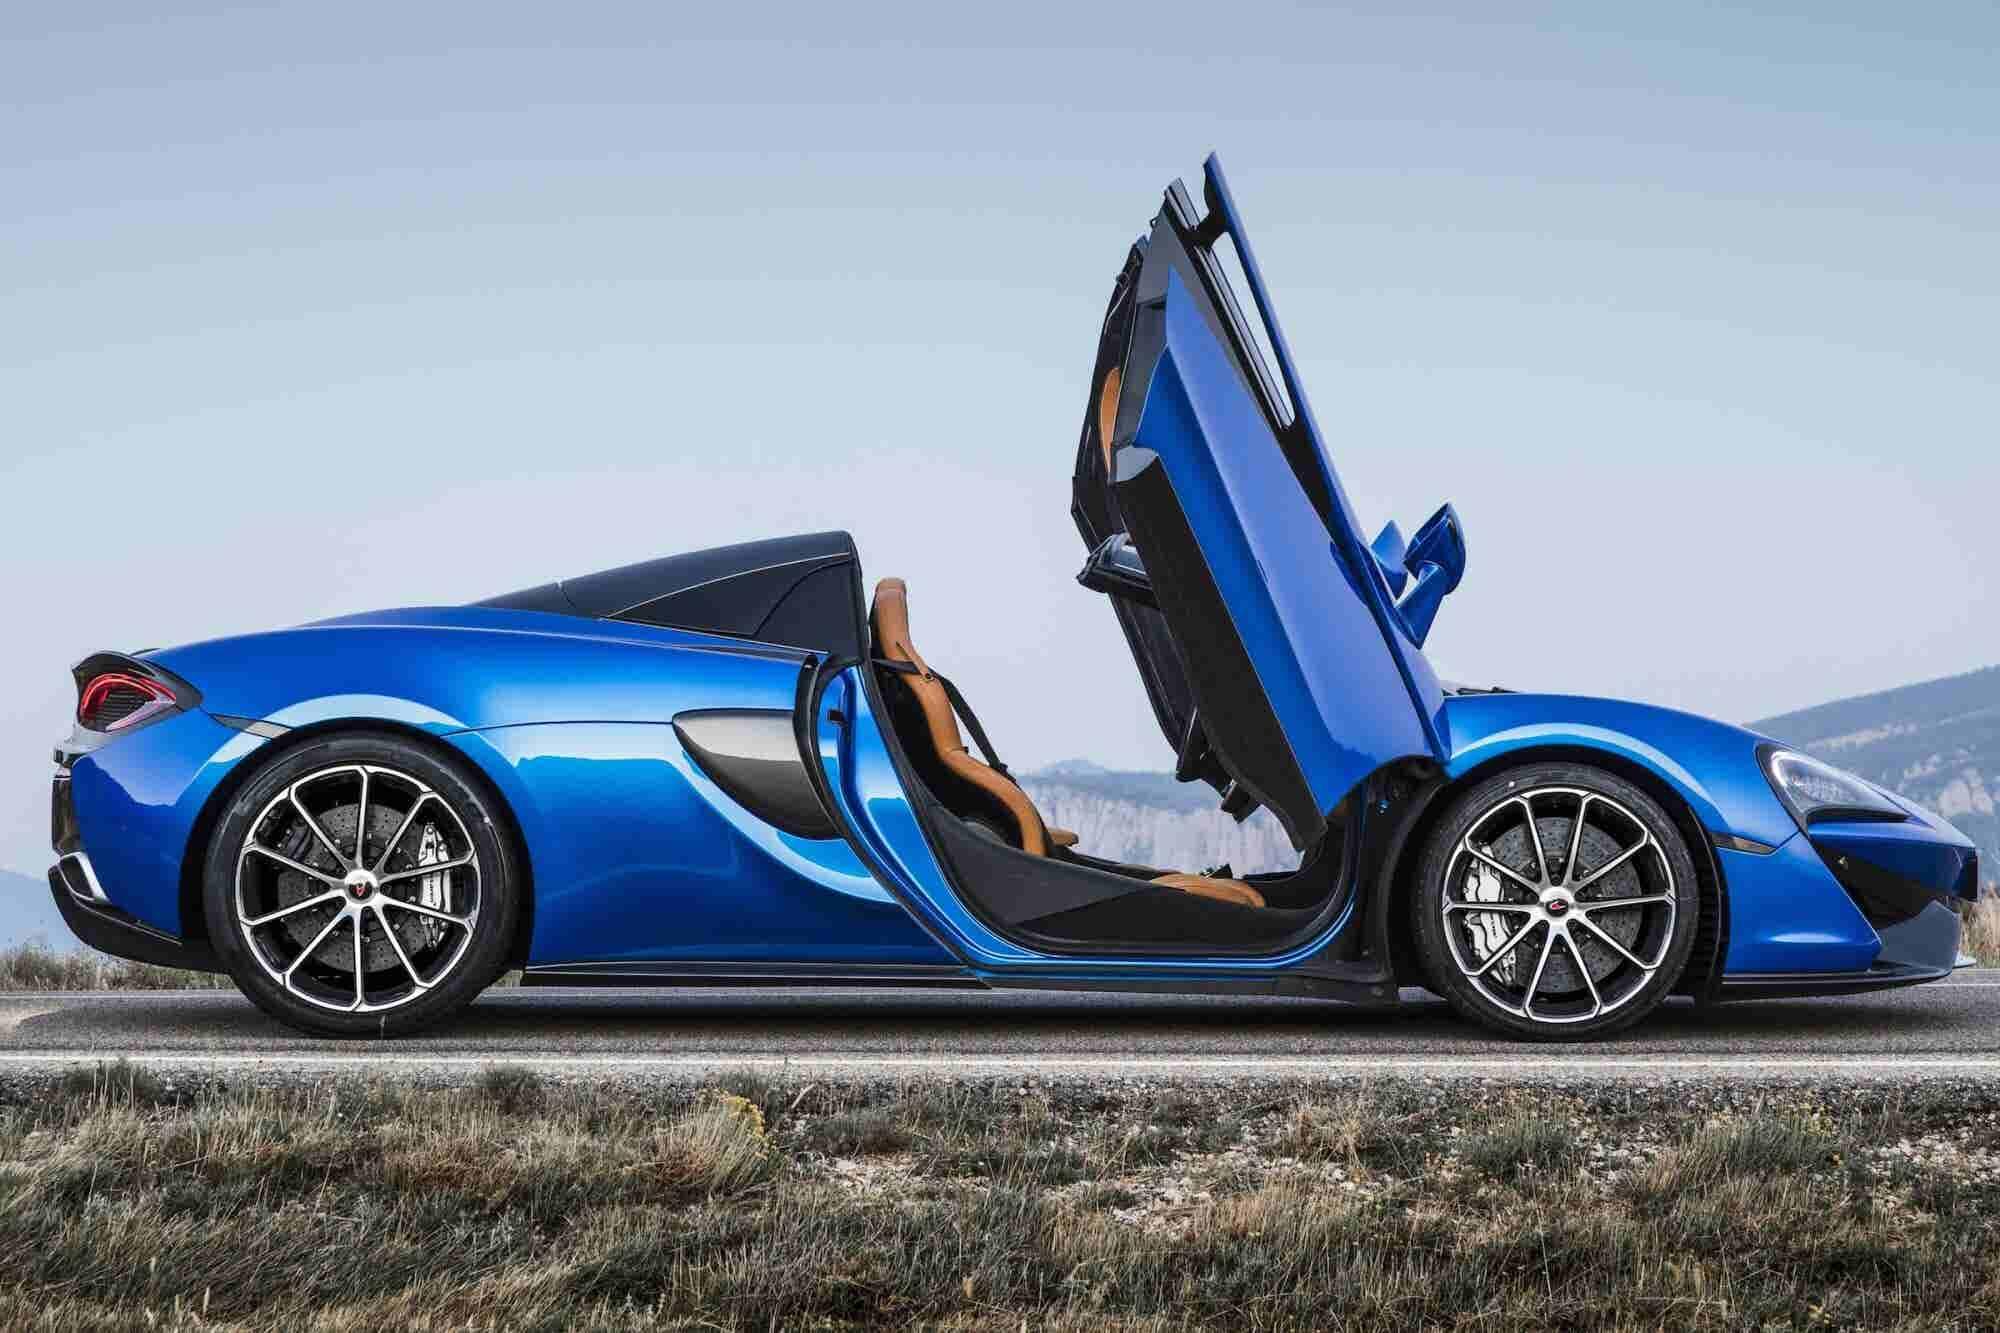 Bucking the Trend, British Supercar Manufacturer McLaren Will Not Buil...